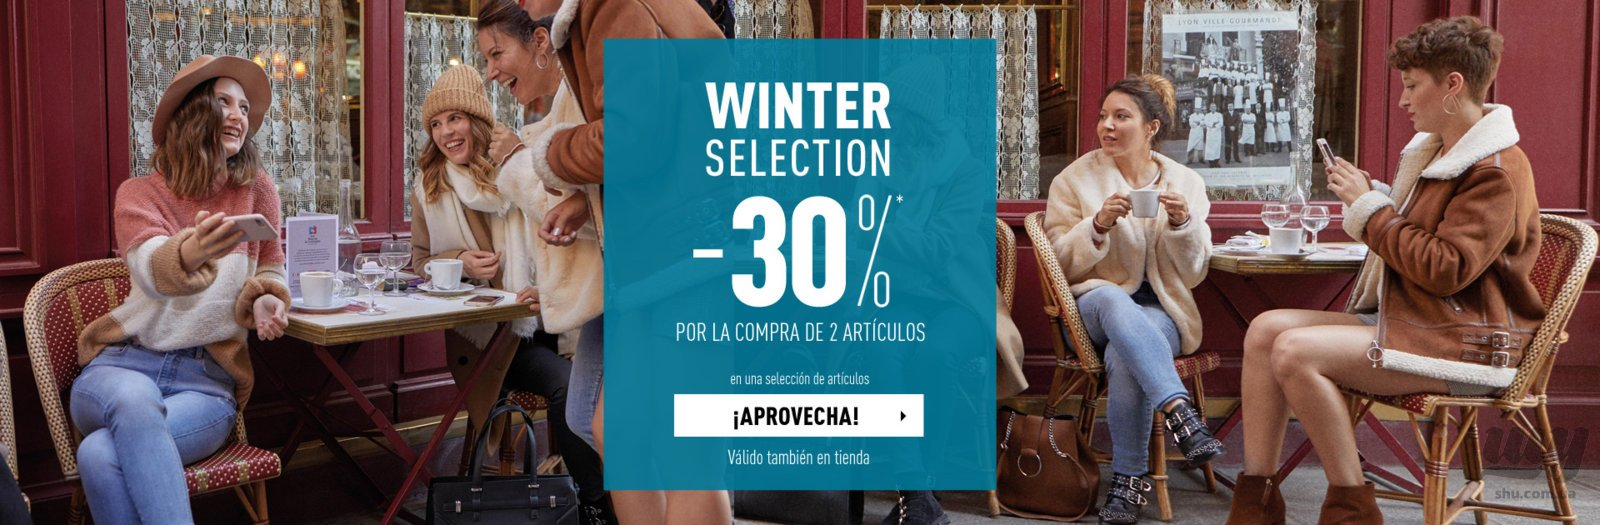 s46_winter_selection_es_full.jpg